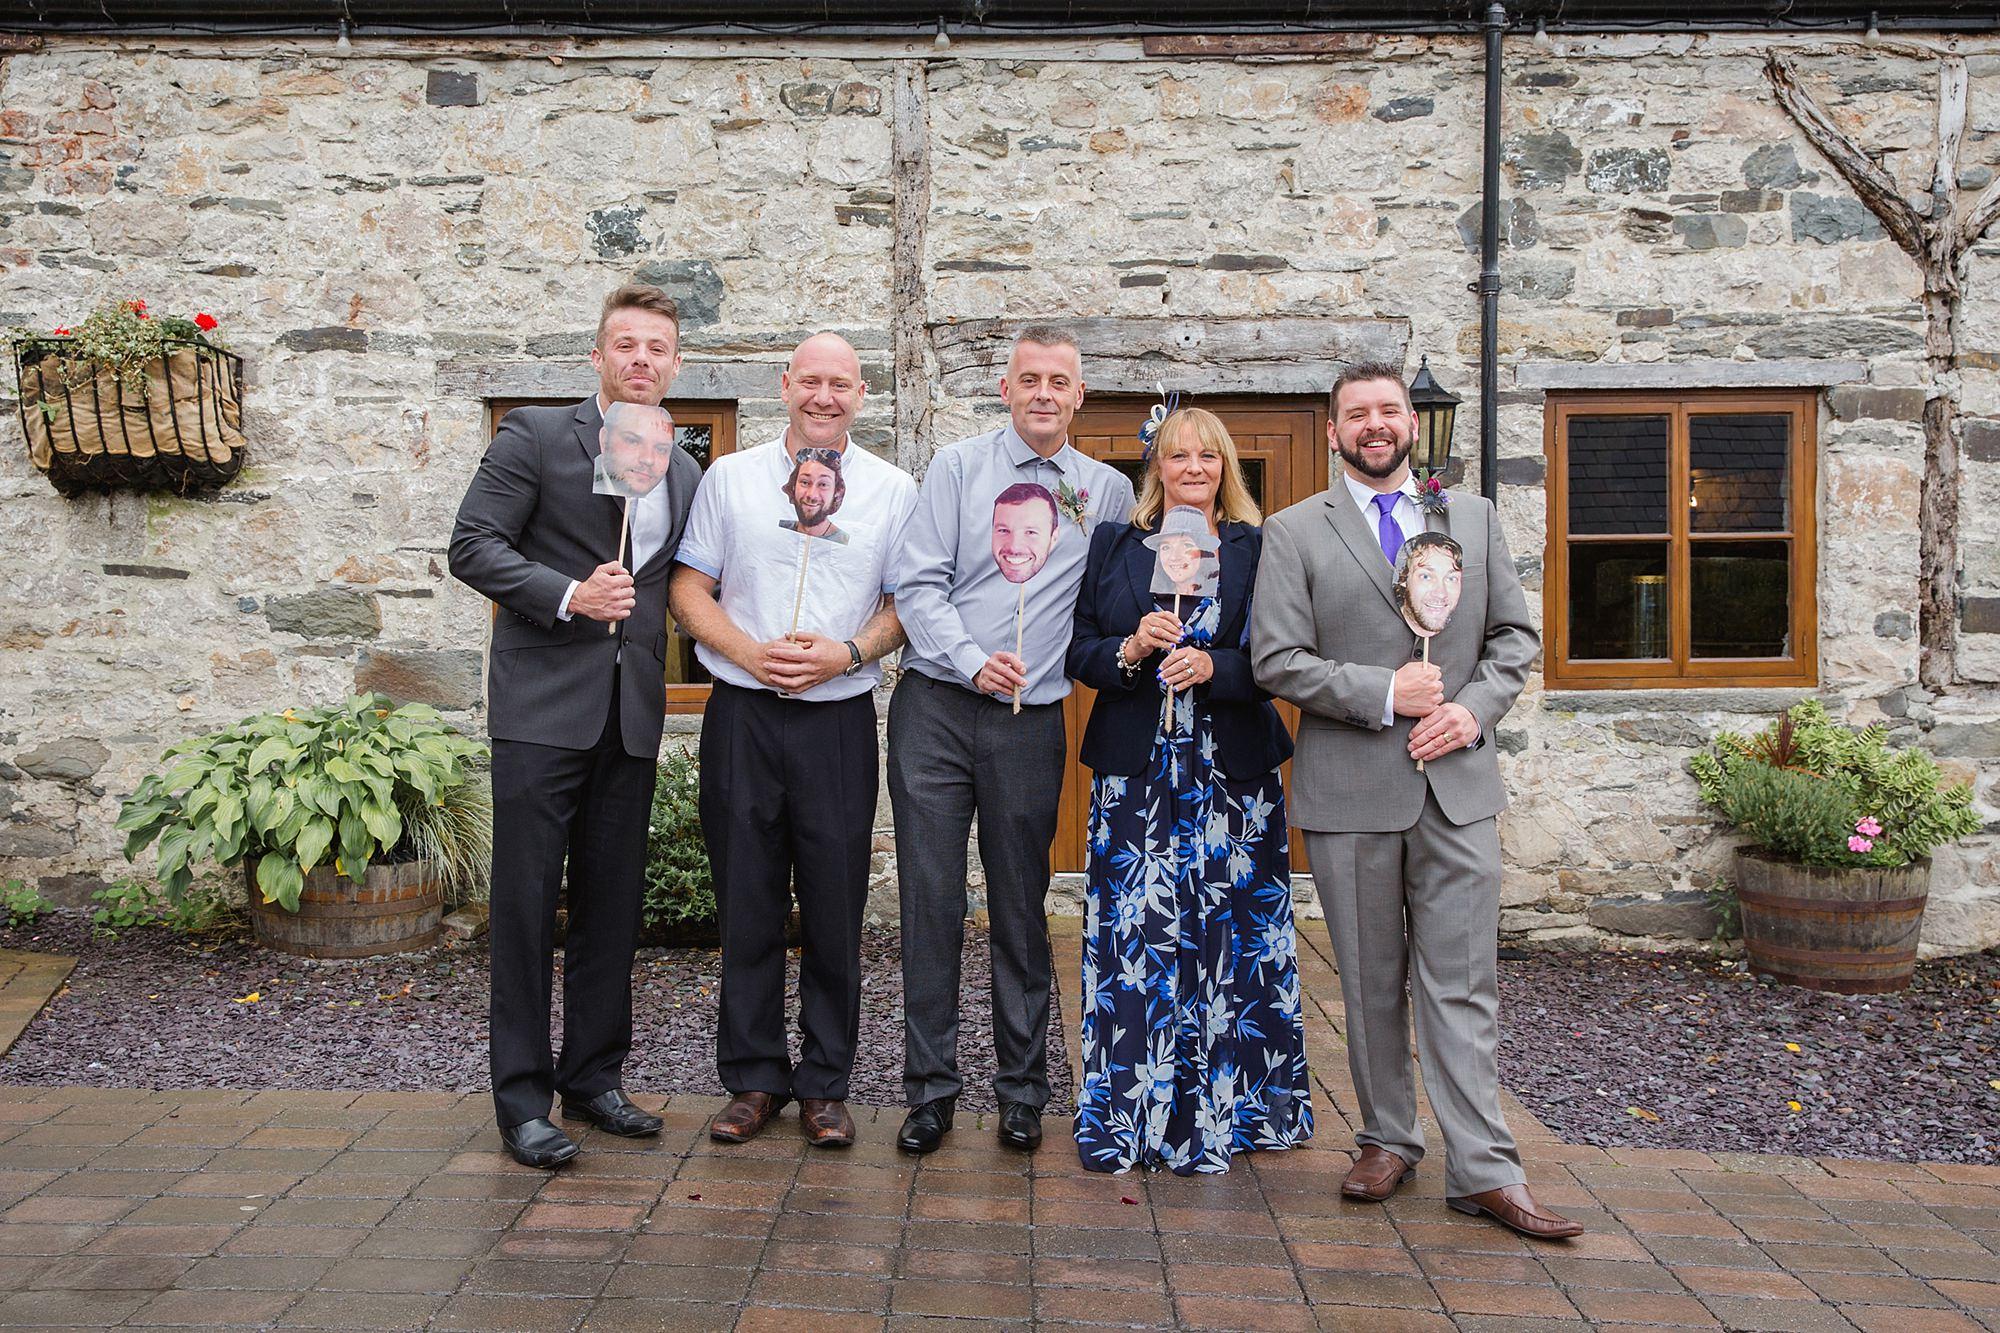 A fun wedding group photo with cutout heads